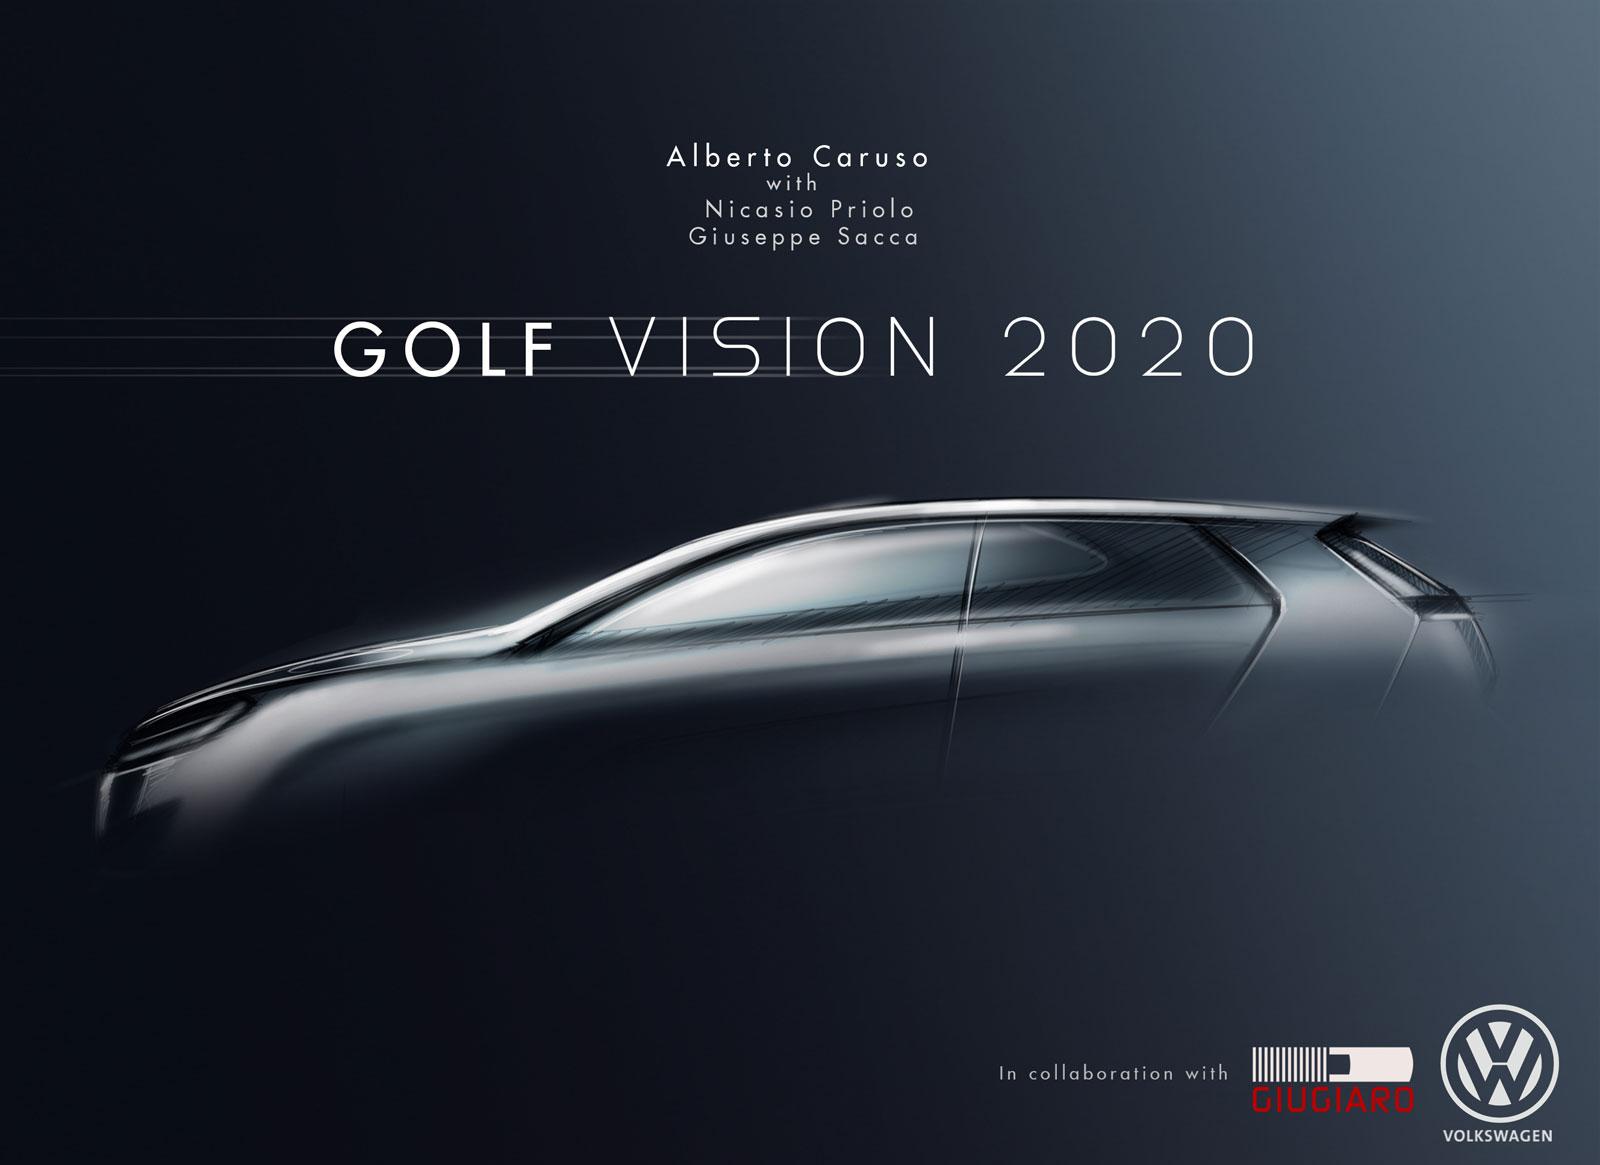 Volkswagen Golf Vision 2020 Concept Cover Car Body Design